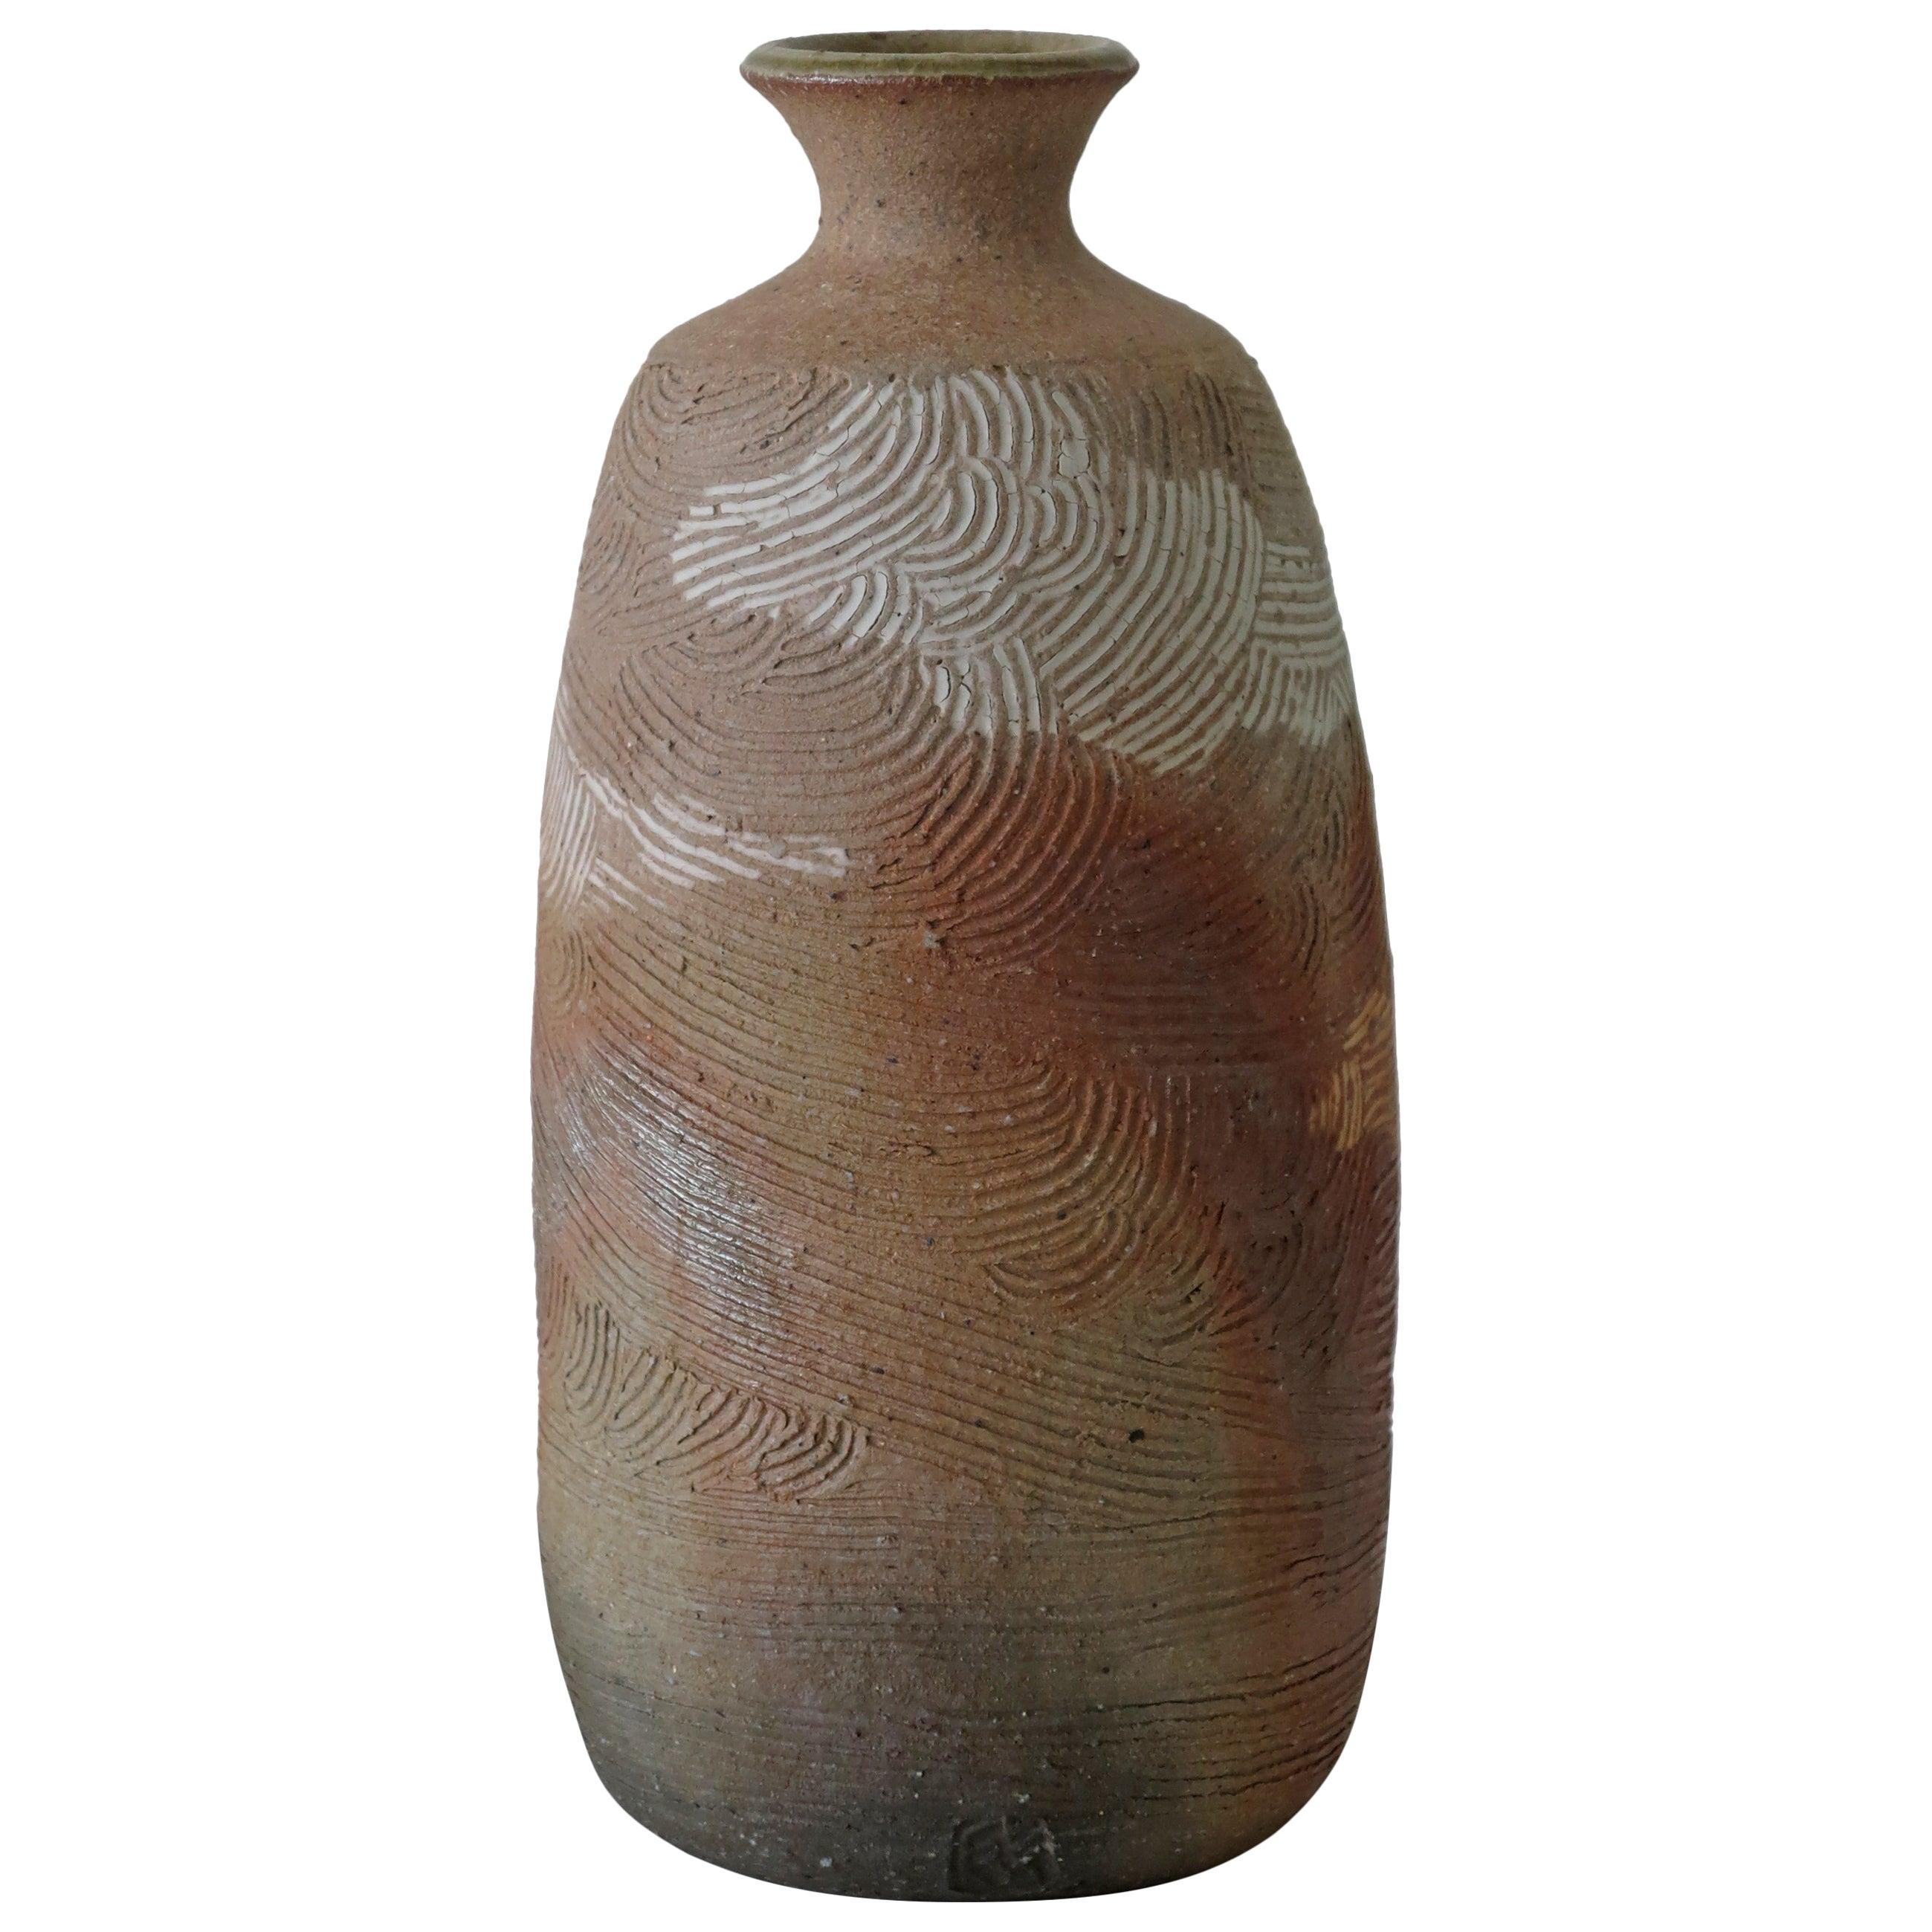 Japanese Incised Art Pottery Vase, Chop Mark